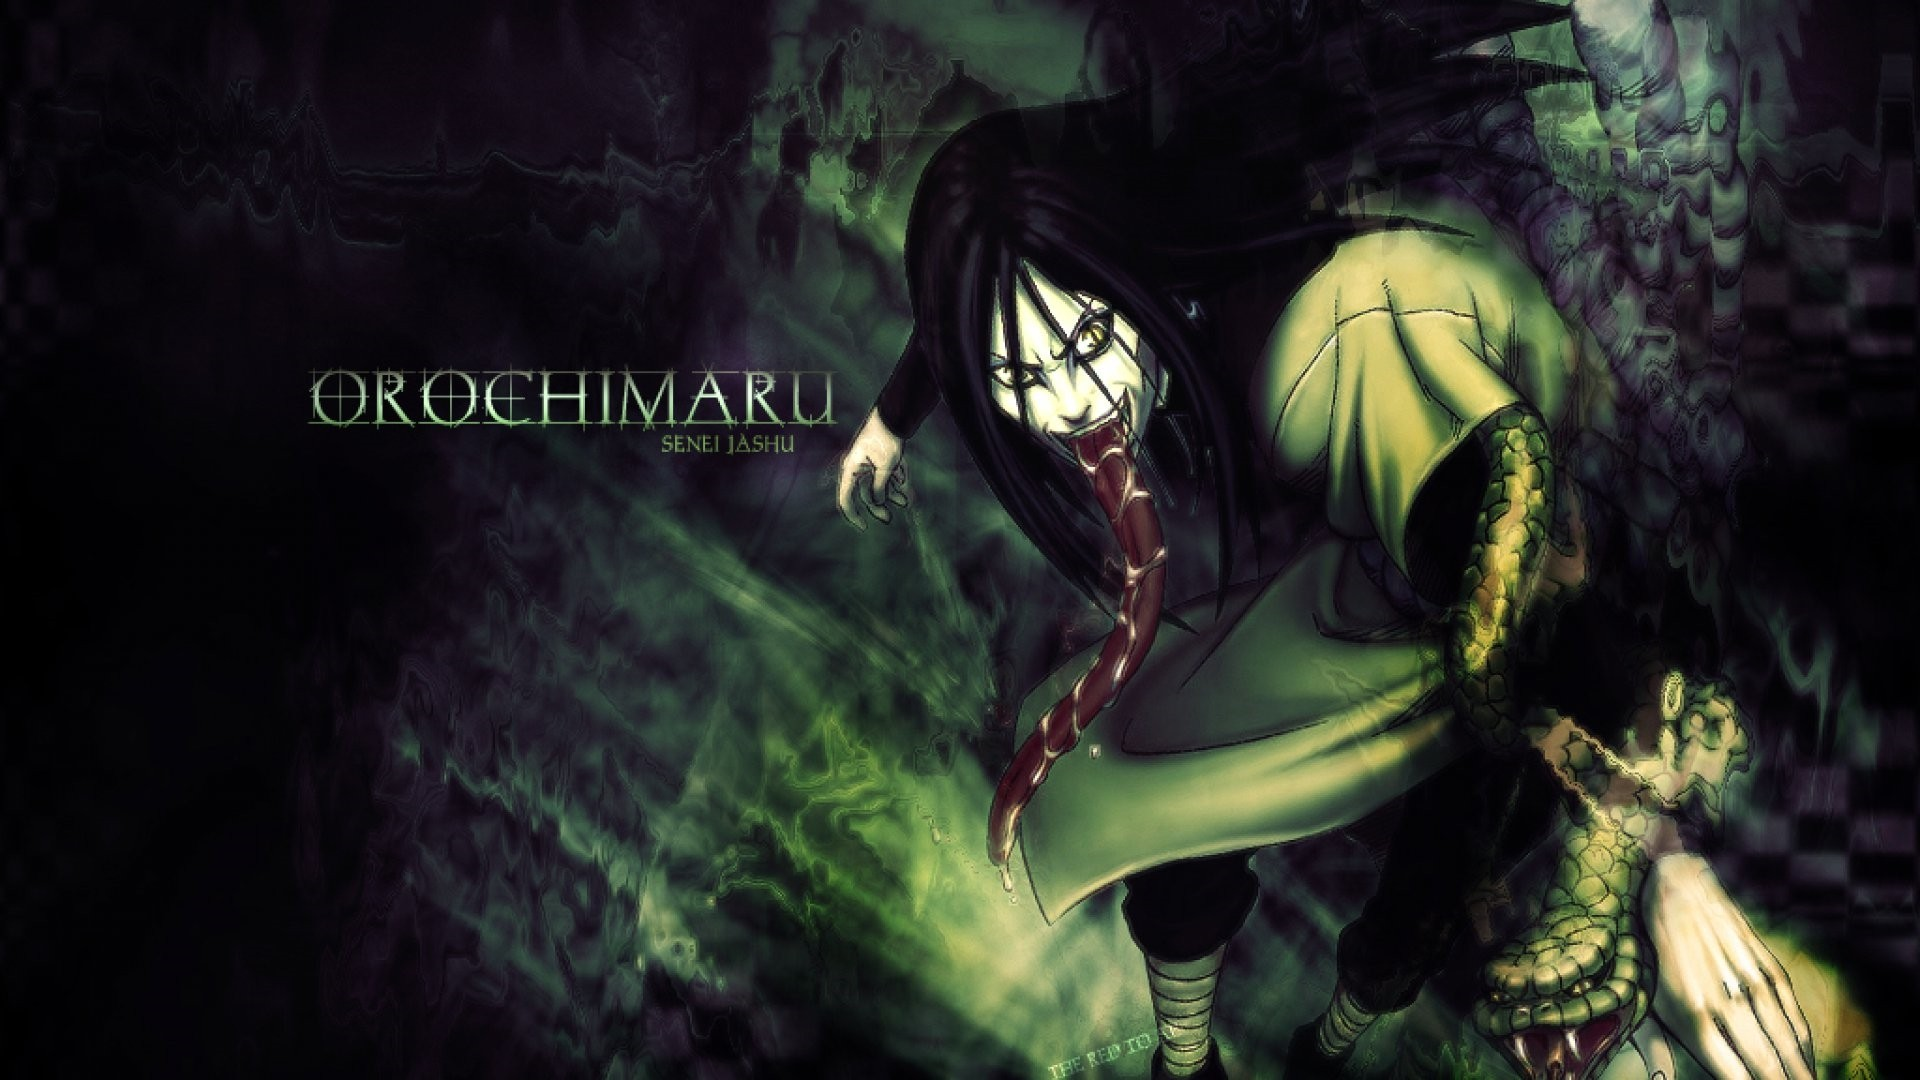 Orochimaru full hd 1080p wallpaper